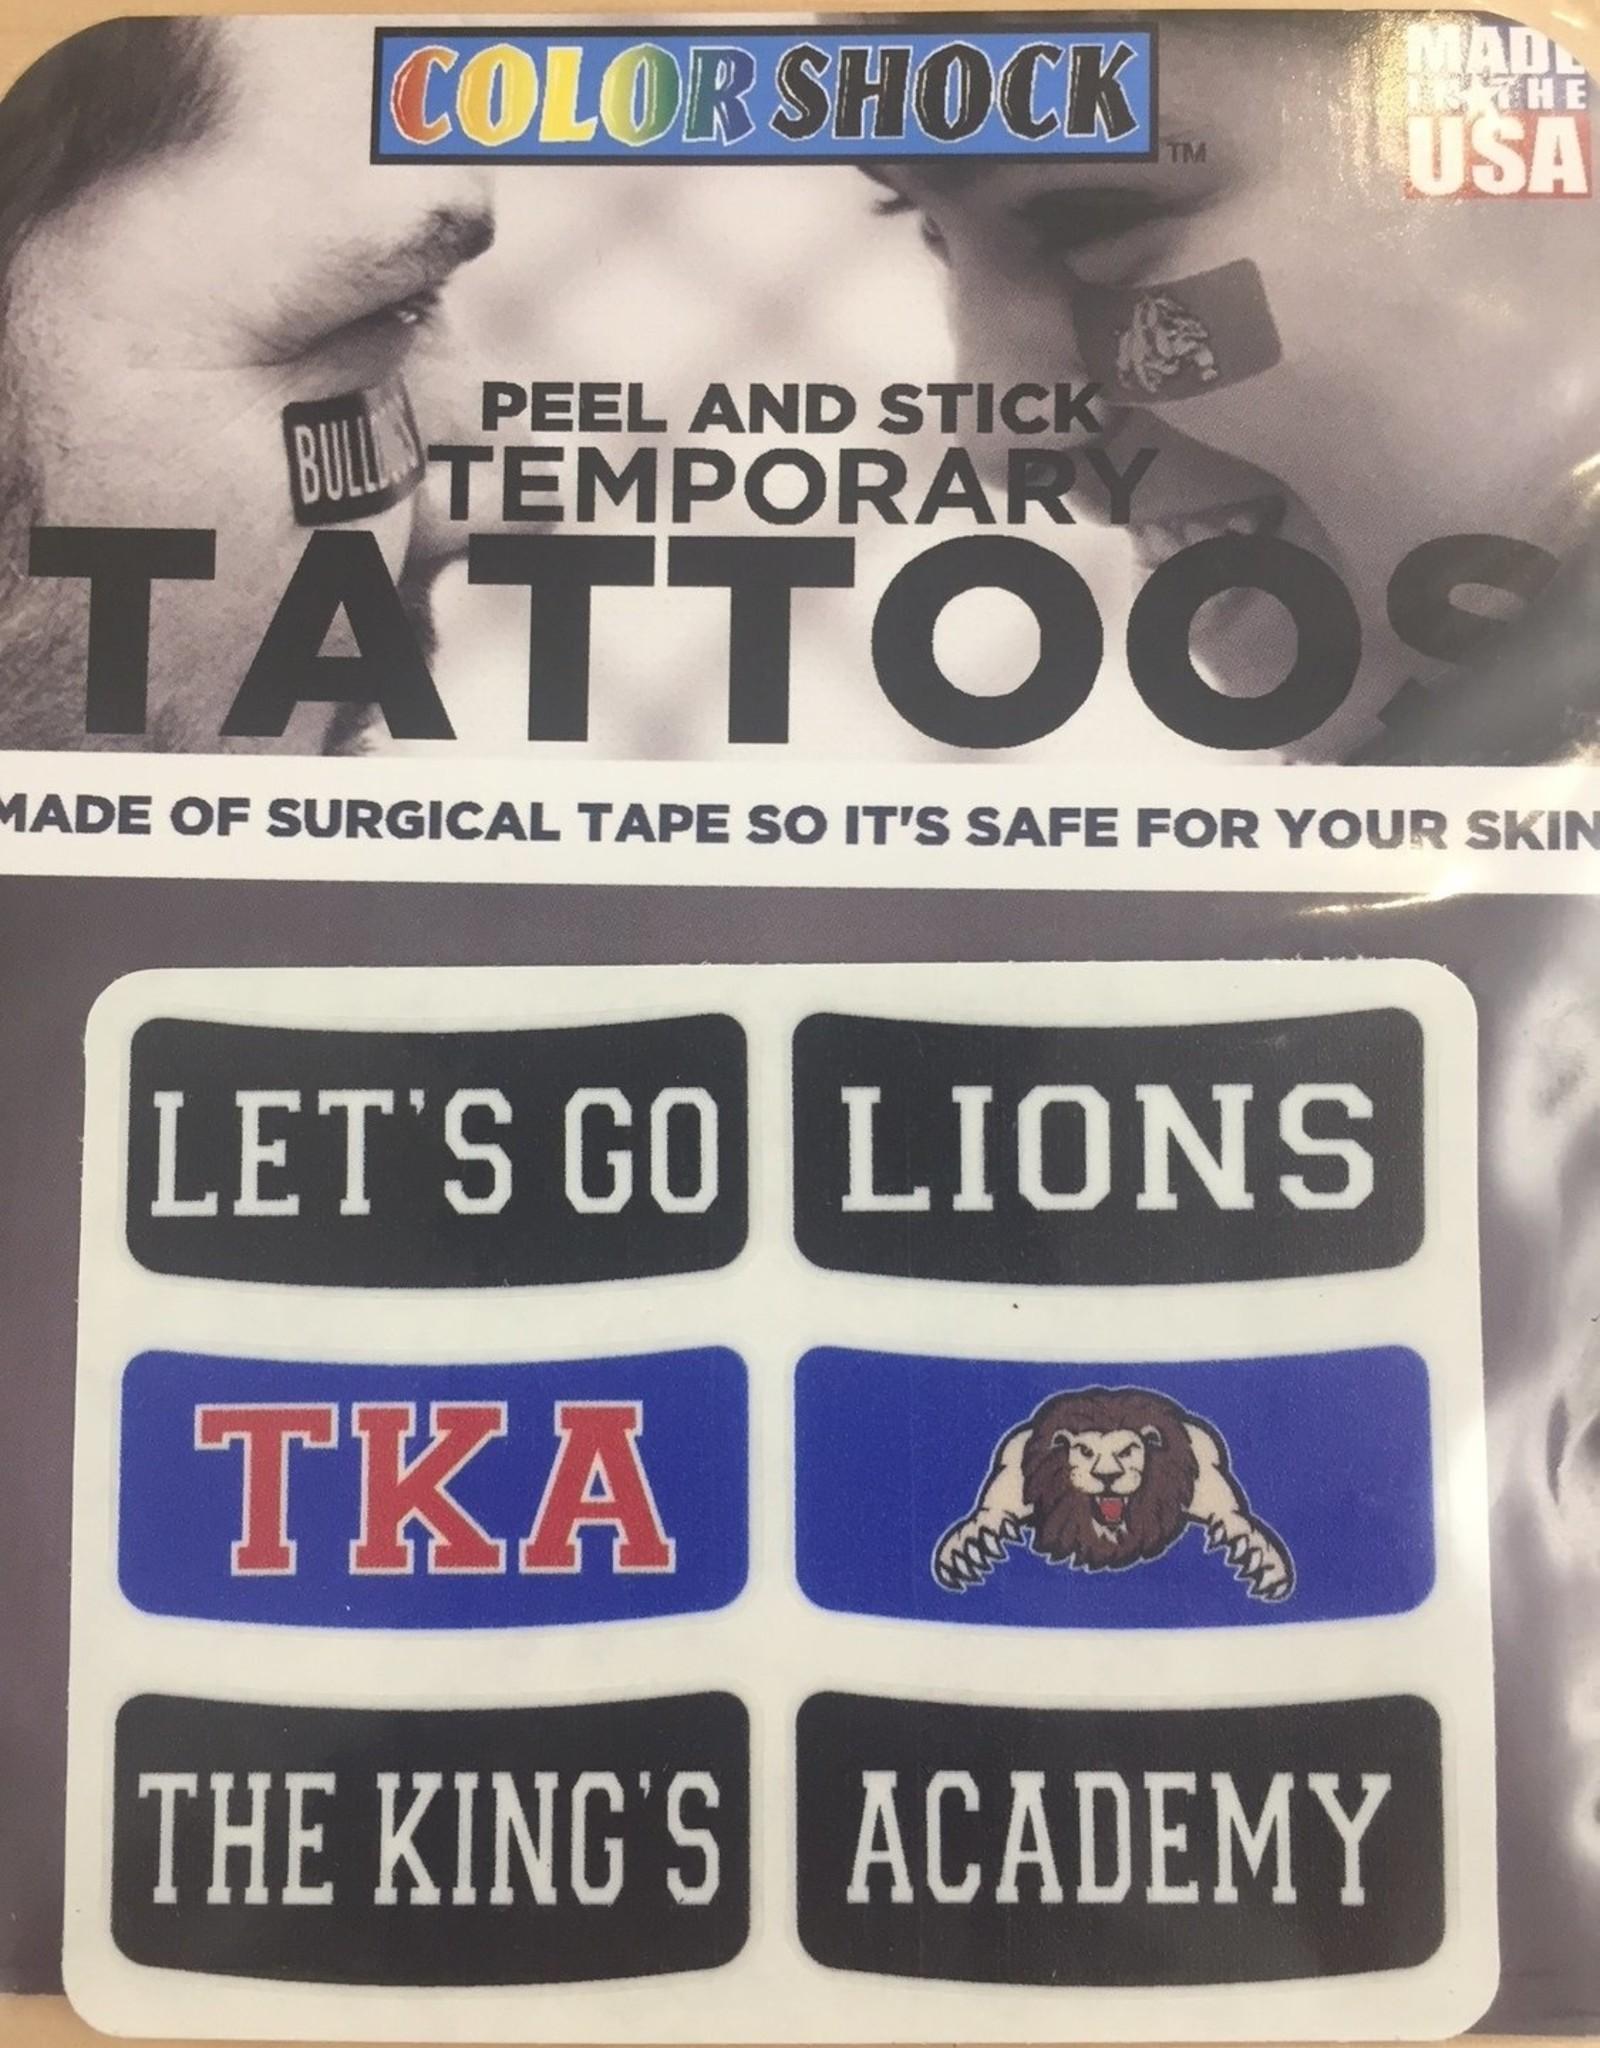 CDI Eyeblack Tattoos 3-pack